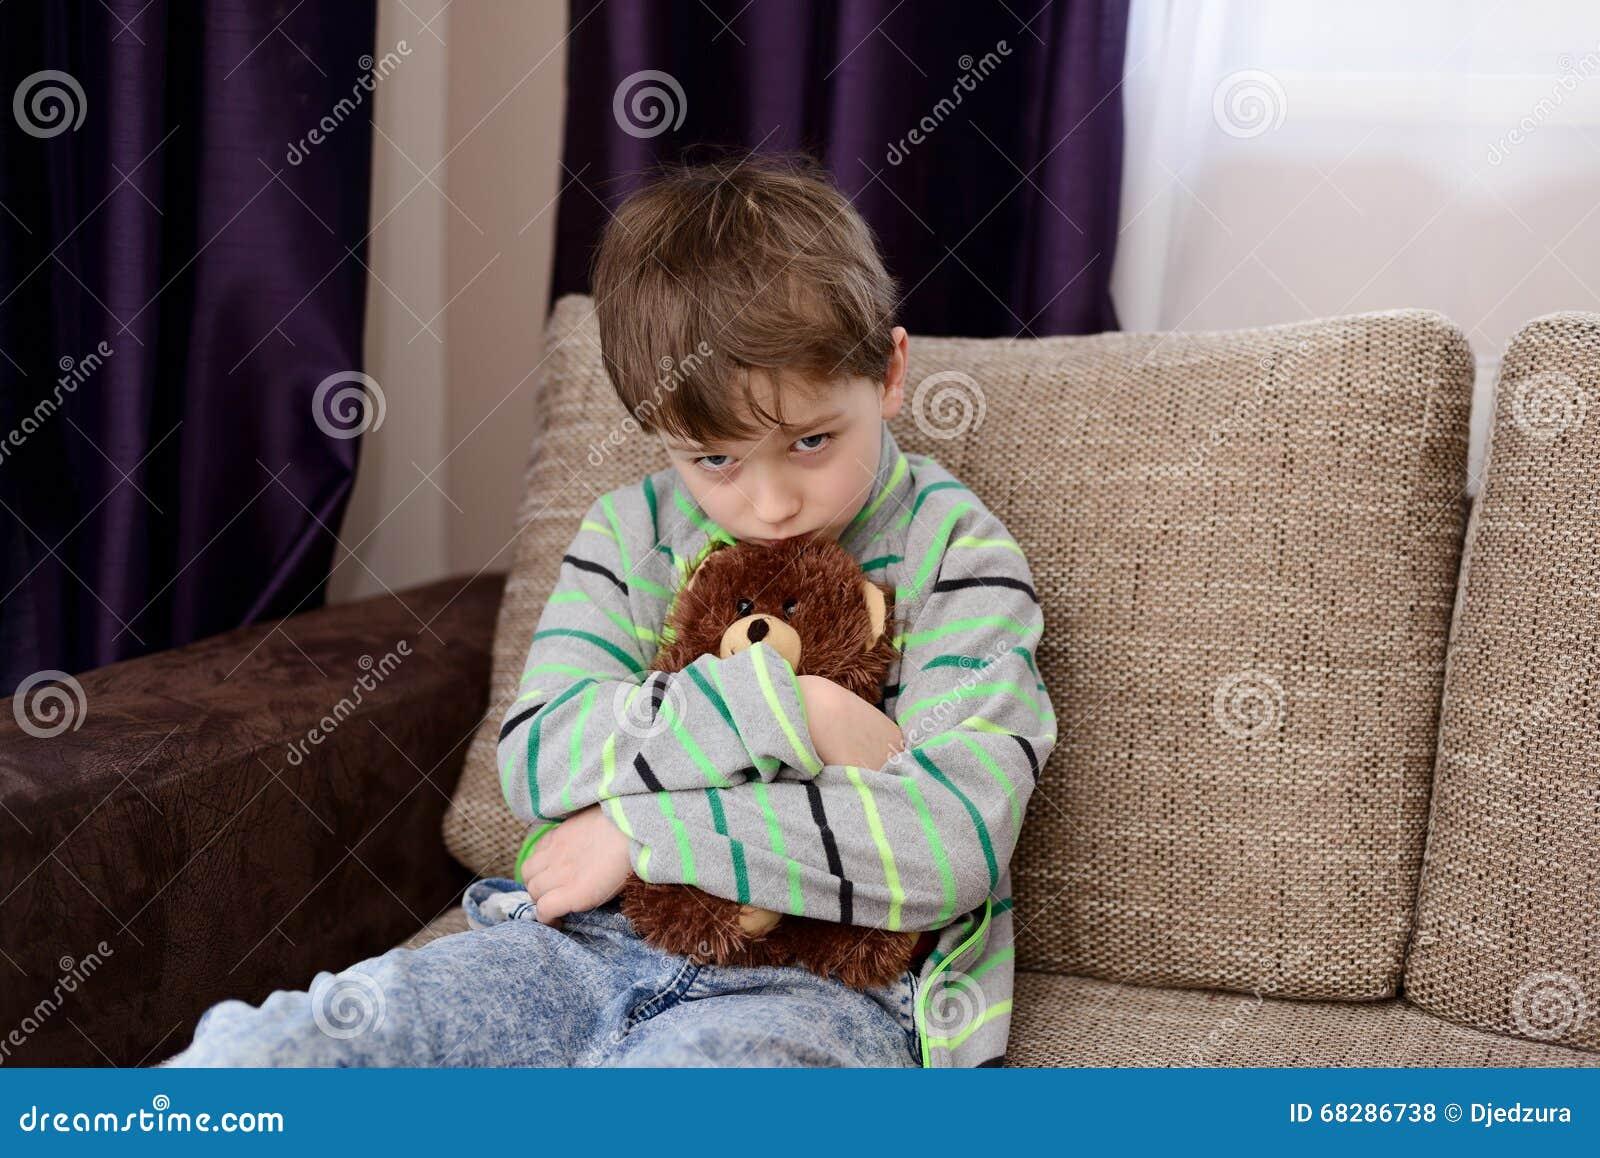 Sad Boy Hugs His Favorite Teddy Bear Stock Photo Image